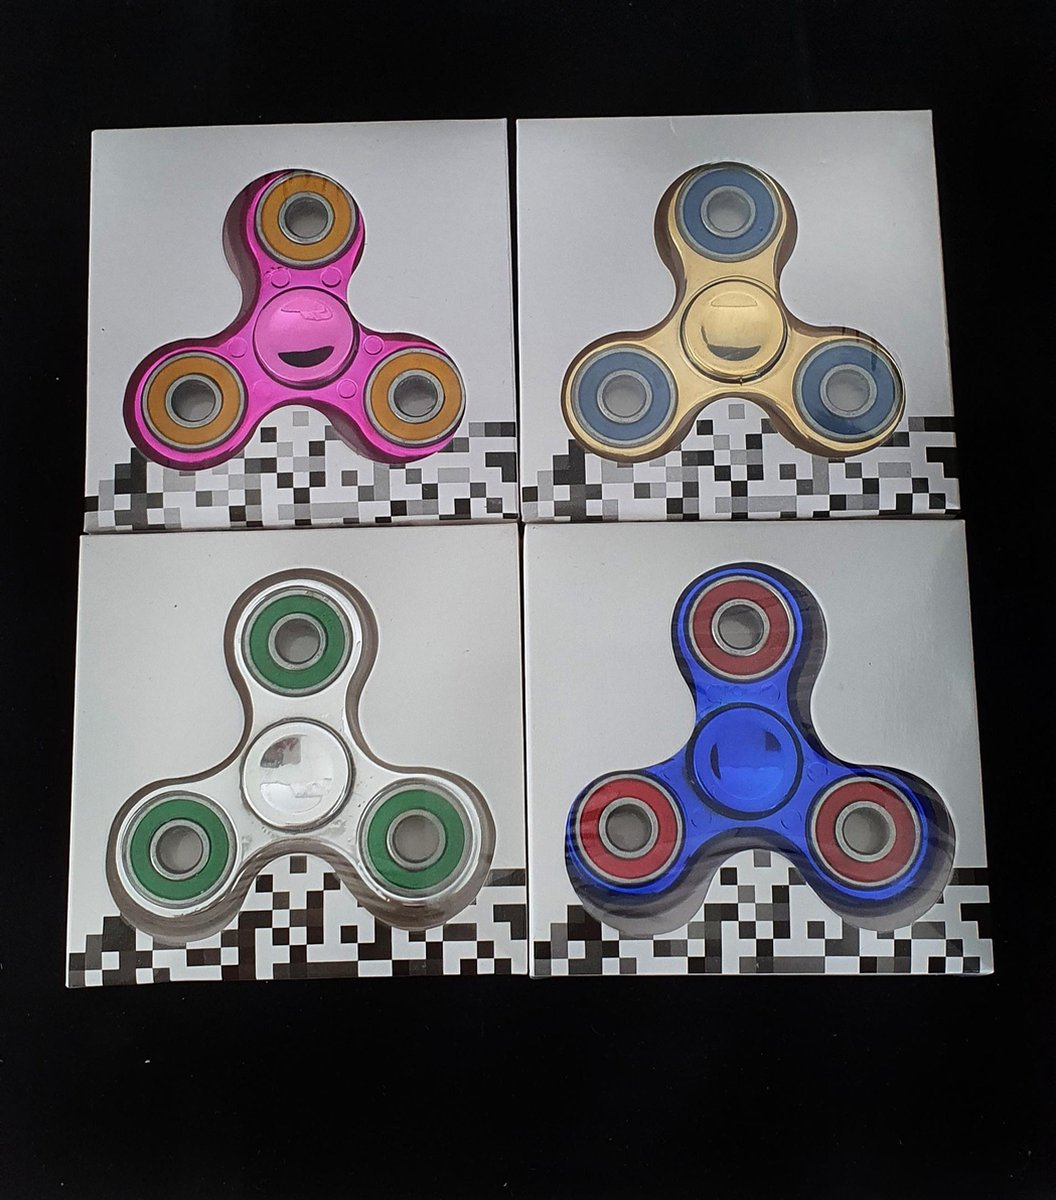 Flip spinners Box van 24 stuks groot verpakking  kleur Goud, Zilver, Donker rose, Donker blauw